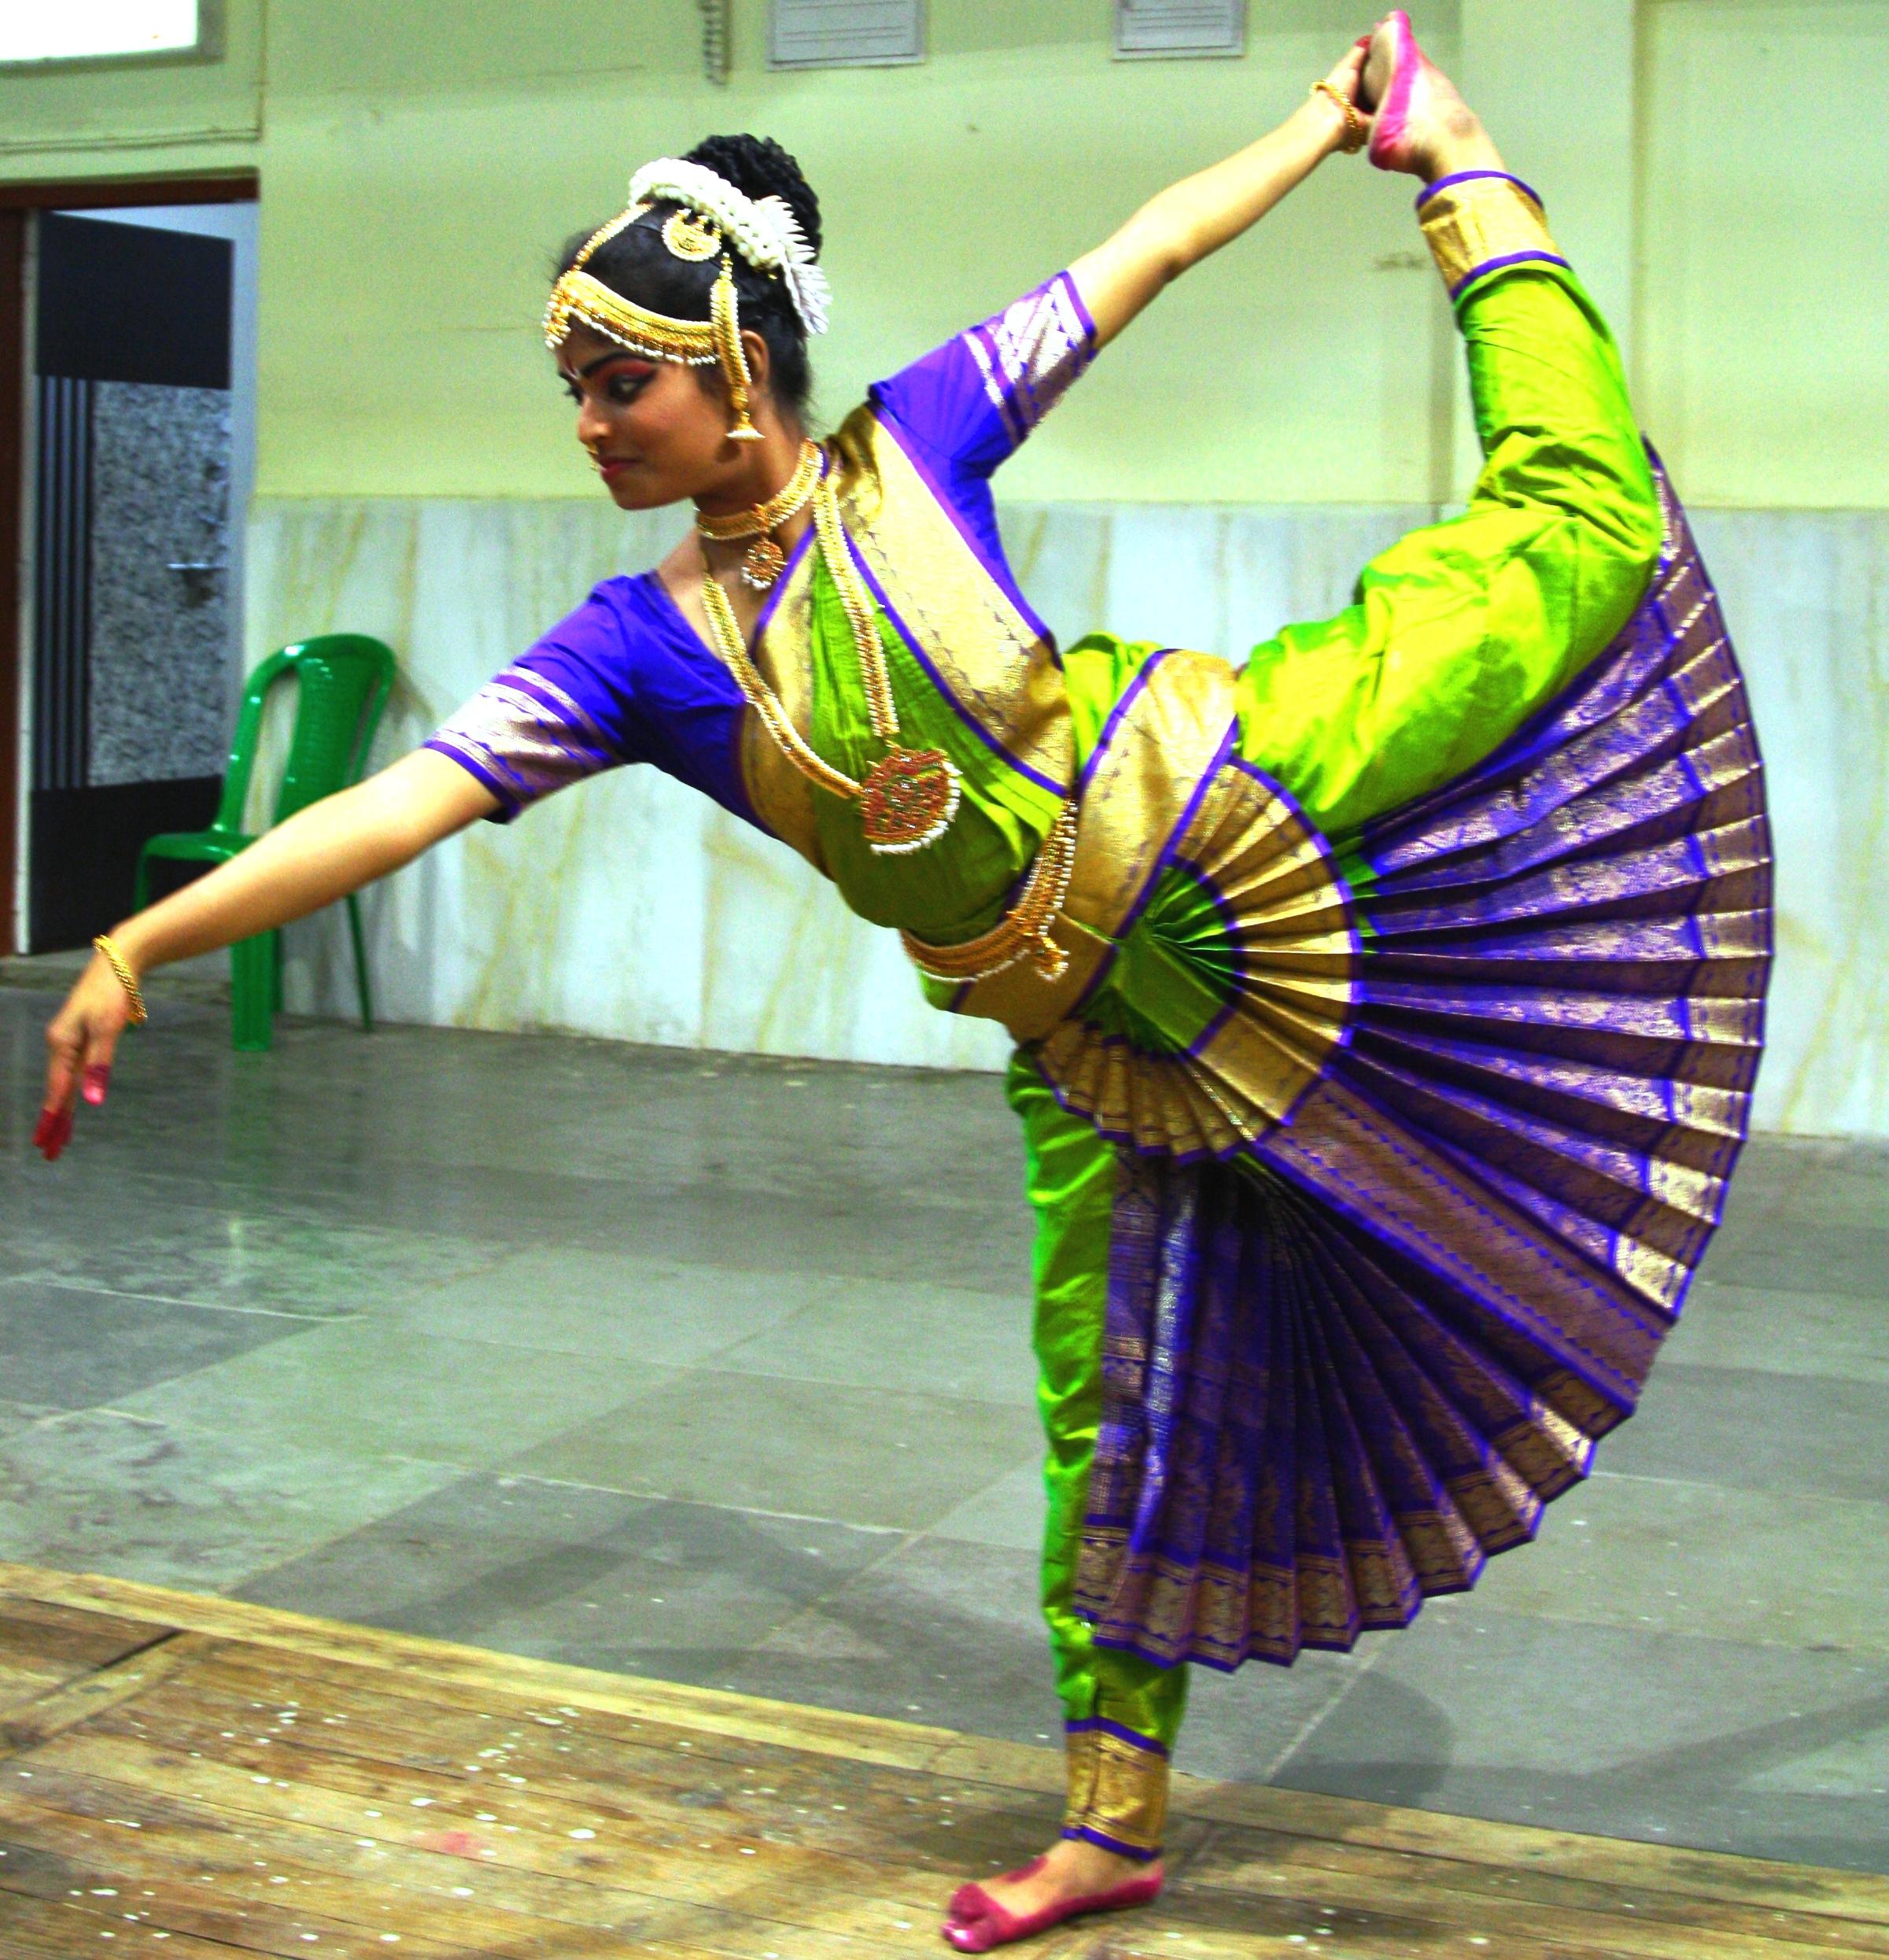 India - Shah